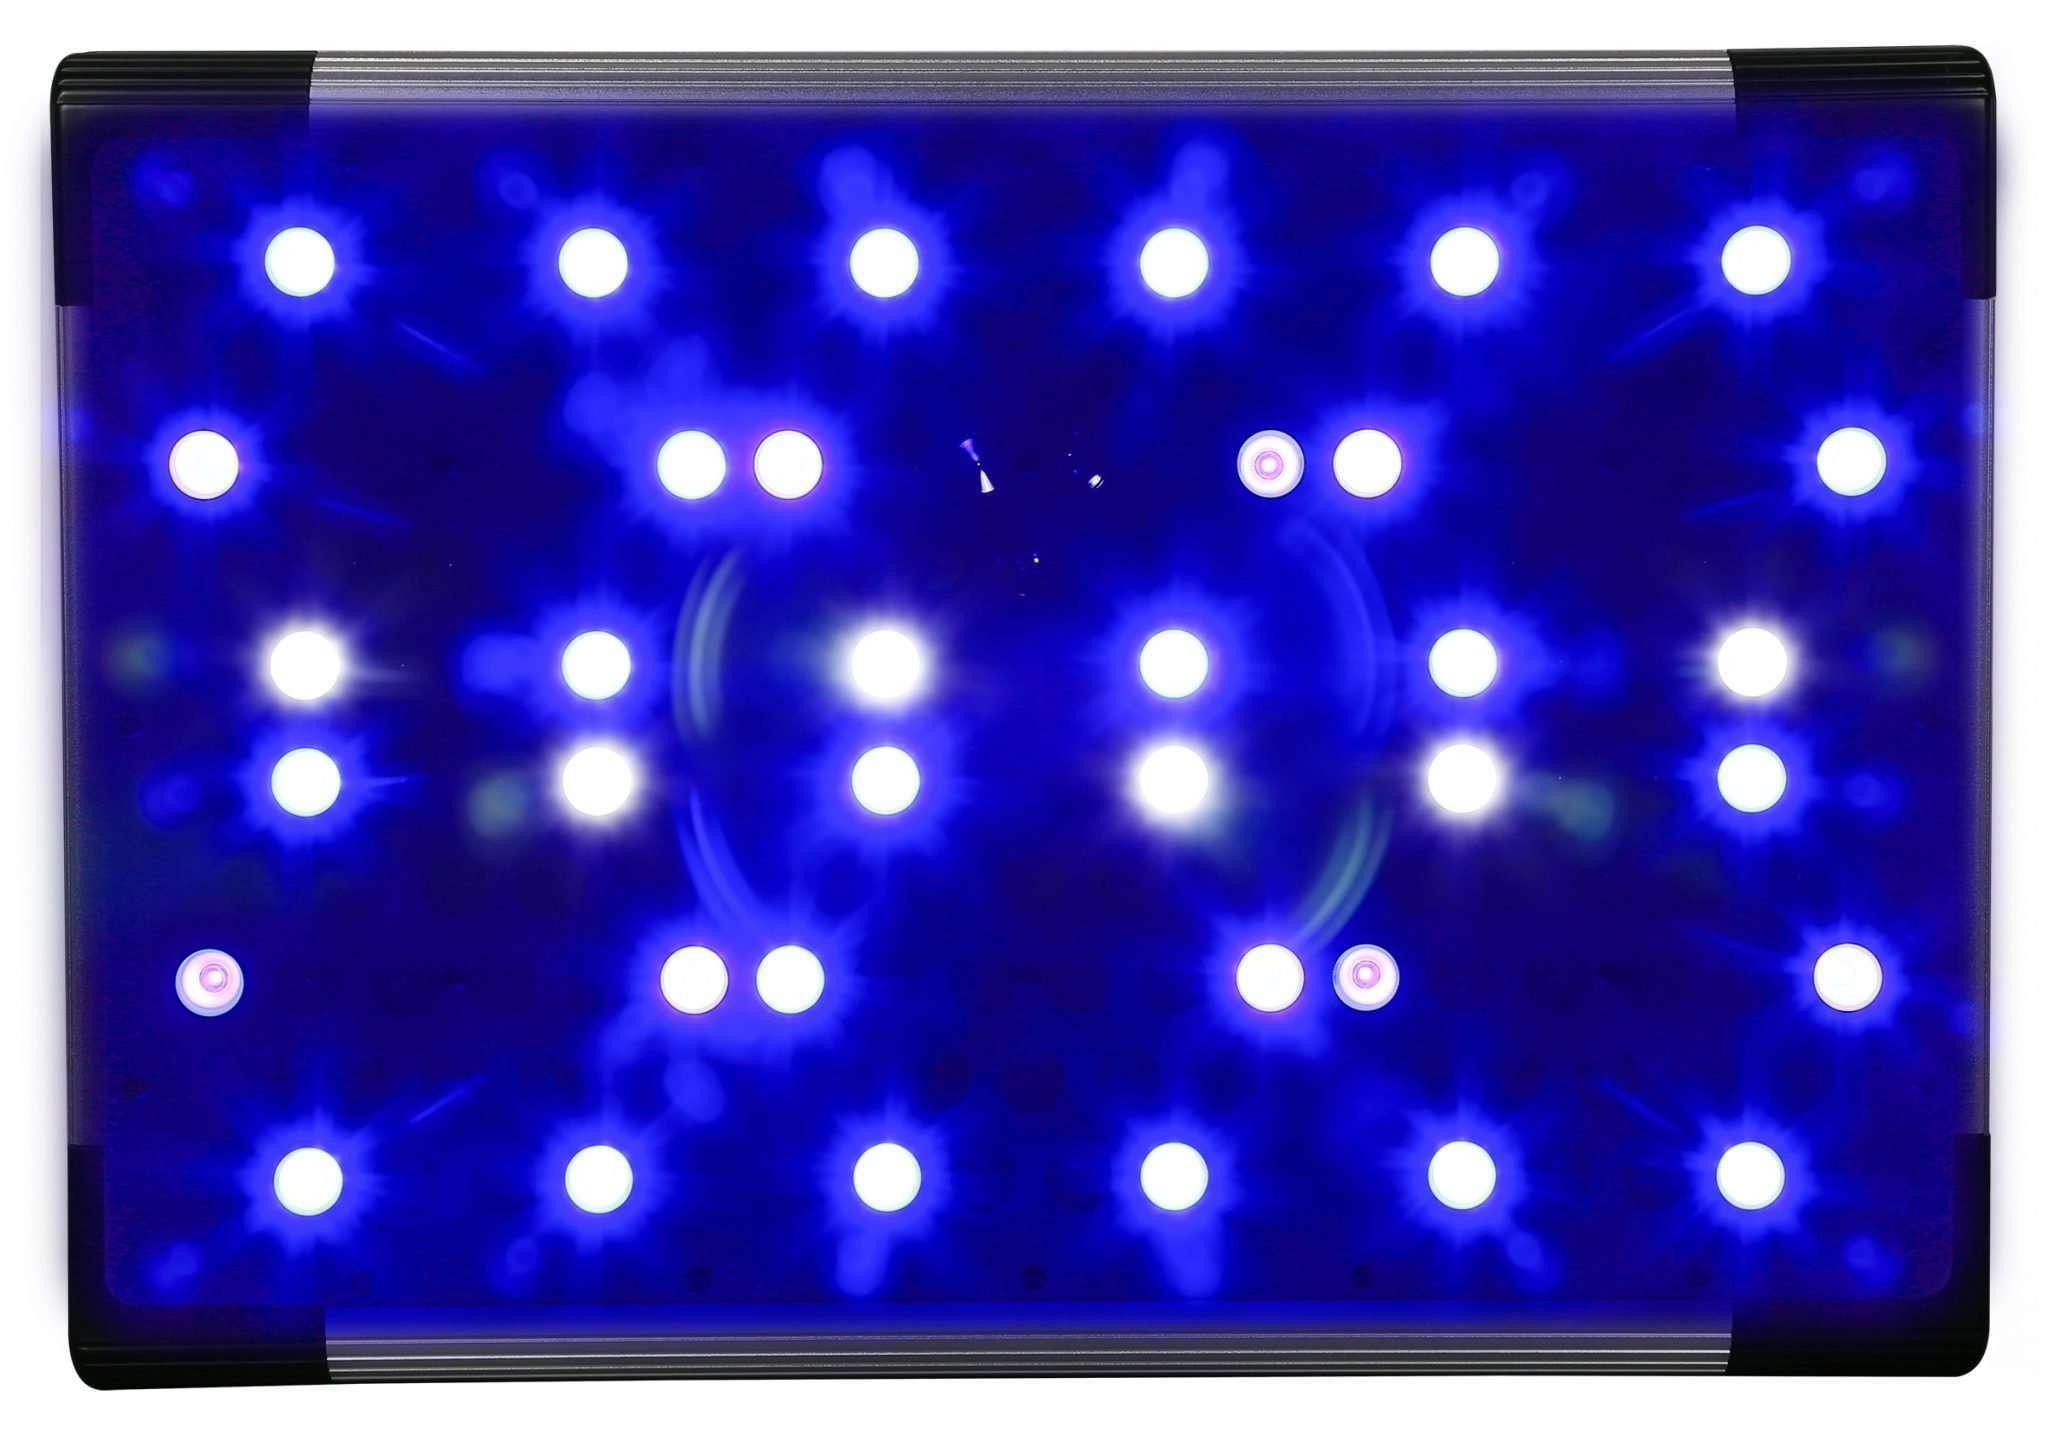 AgroLED Dio-Watt 432, 265W Full Spectrum Low Pro blue spectrum